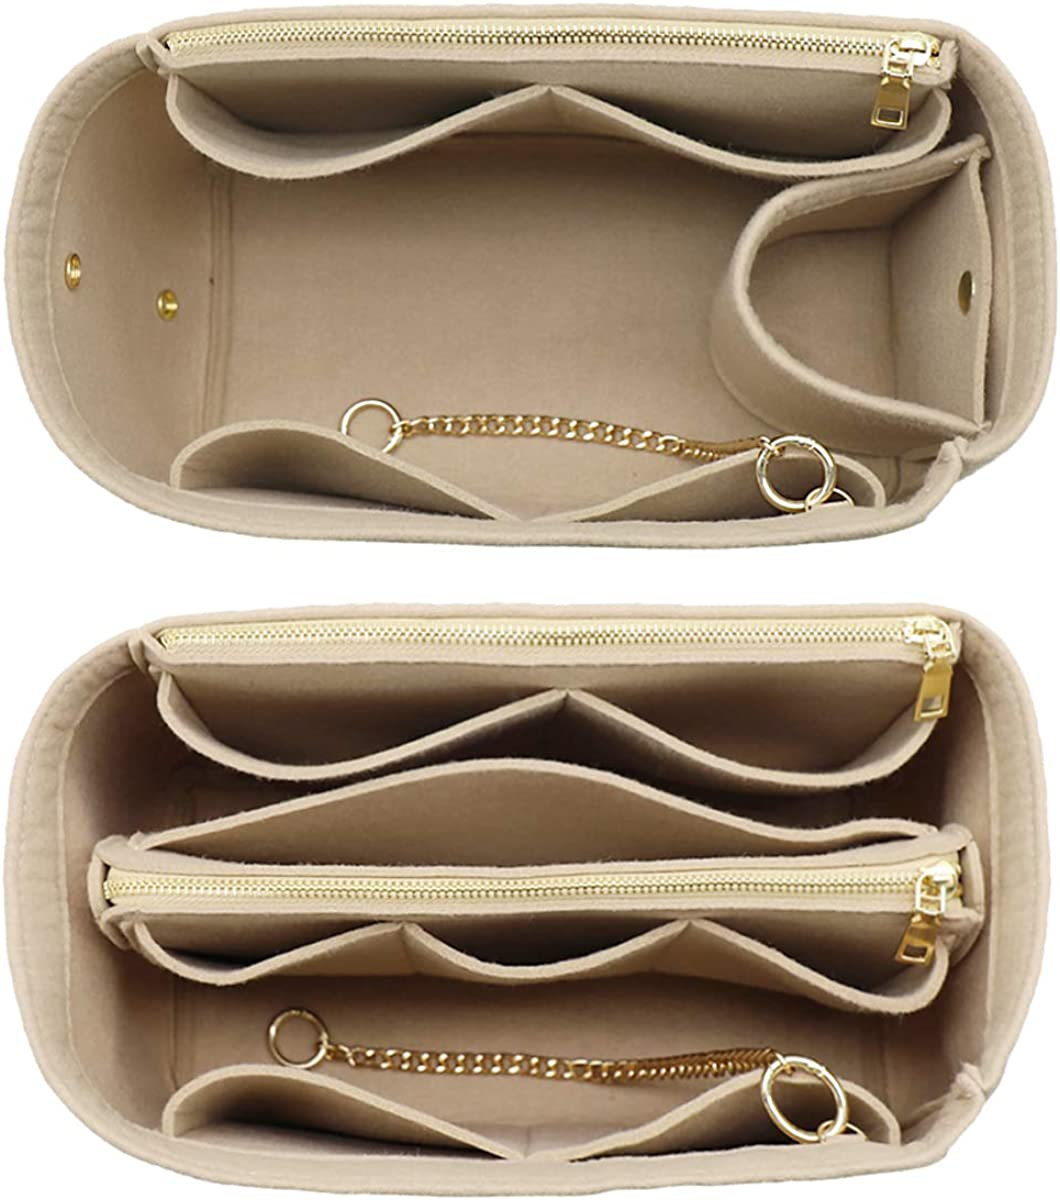 3 in 1 Felt Purse Organizer Insert Bag in Bag with a Bottle Holder Shaper